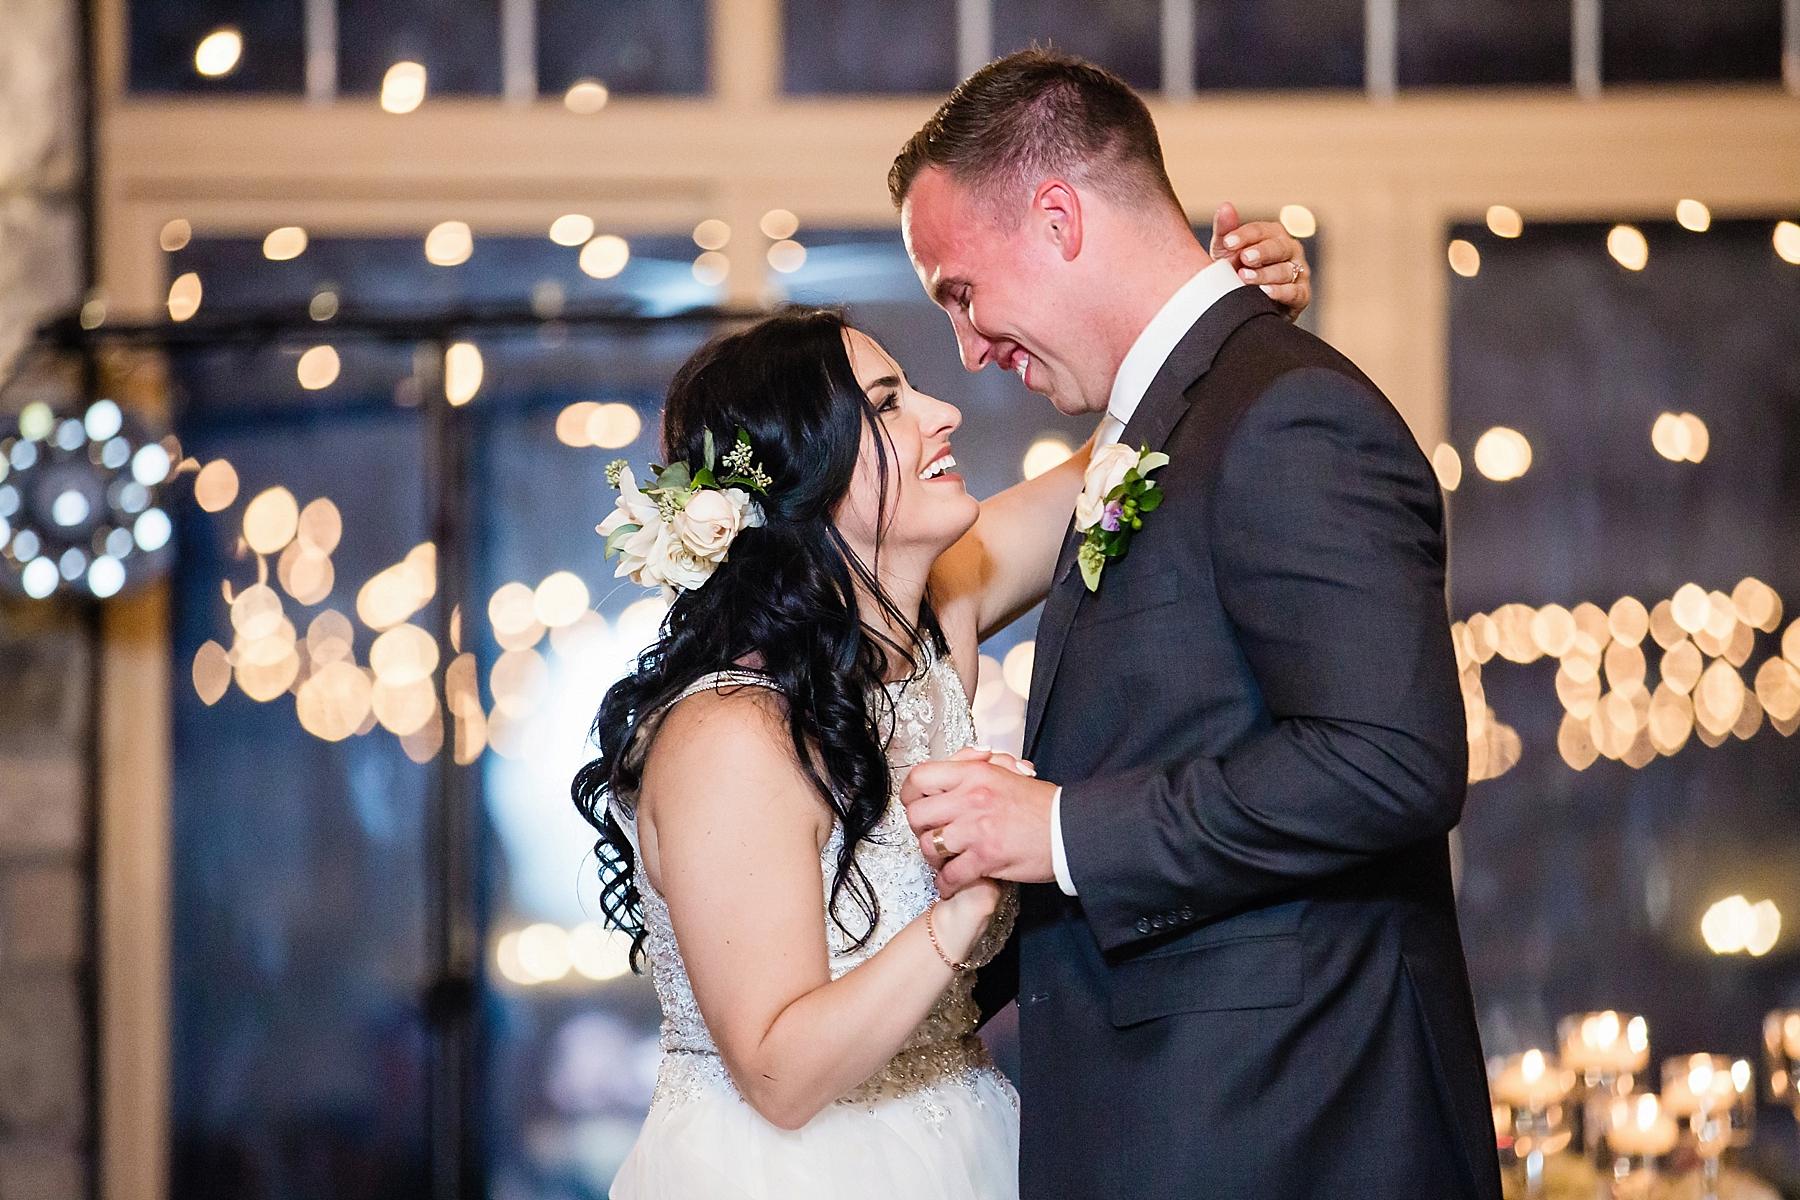 windsor-wedding-photographer-sprucewood-shores-winery-wedding-niagara-on-the-lake-wedding-photographer-eryn-shea-photography_0078.jpg